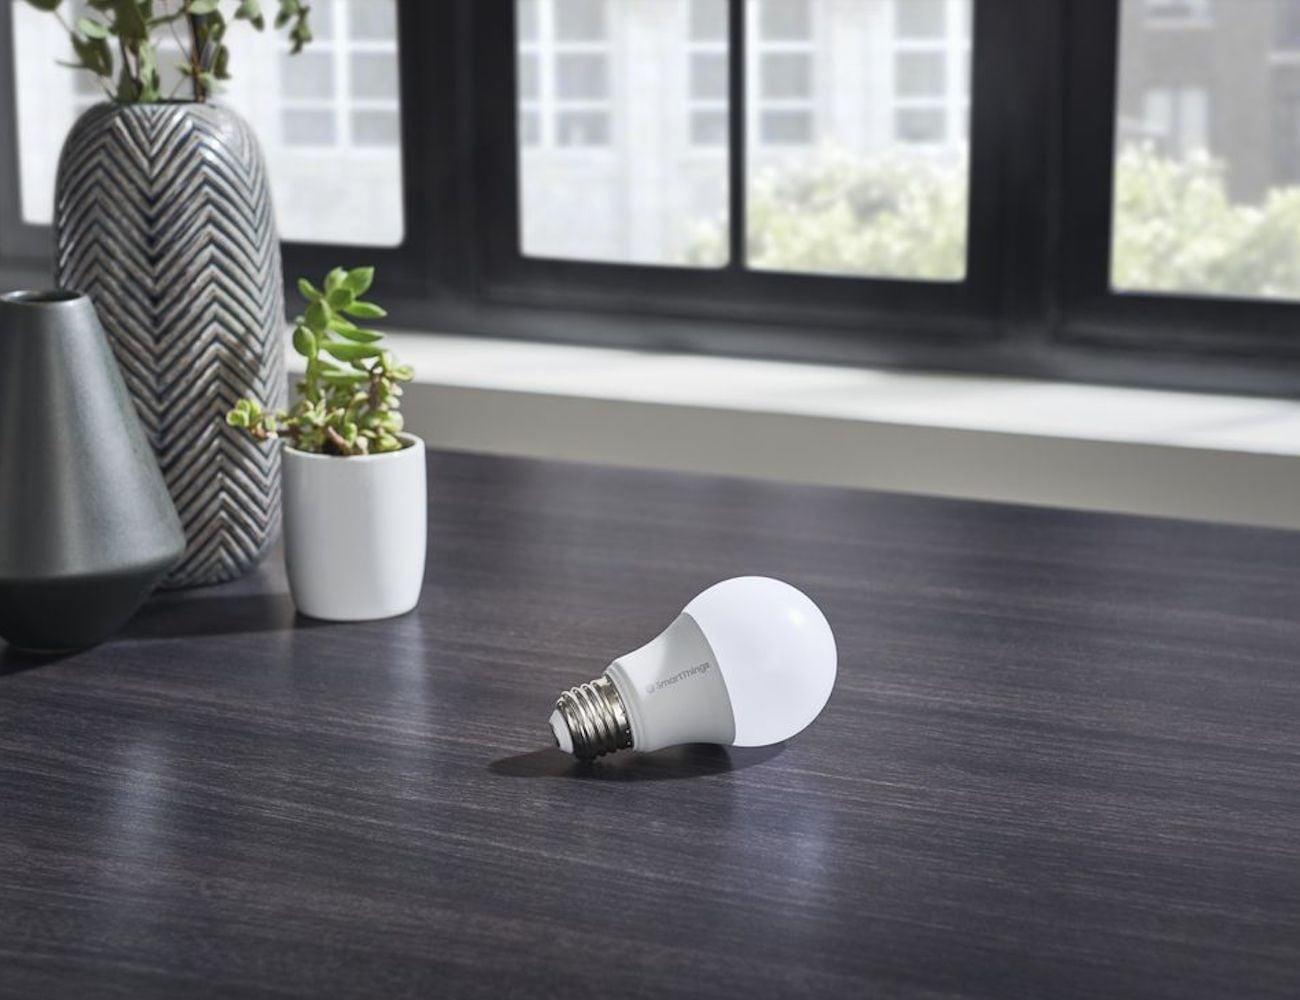 Samsung SmartThings Smart Bulb uses energy-efficient LED bulbs